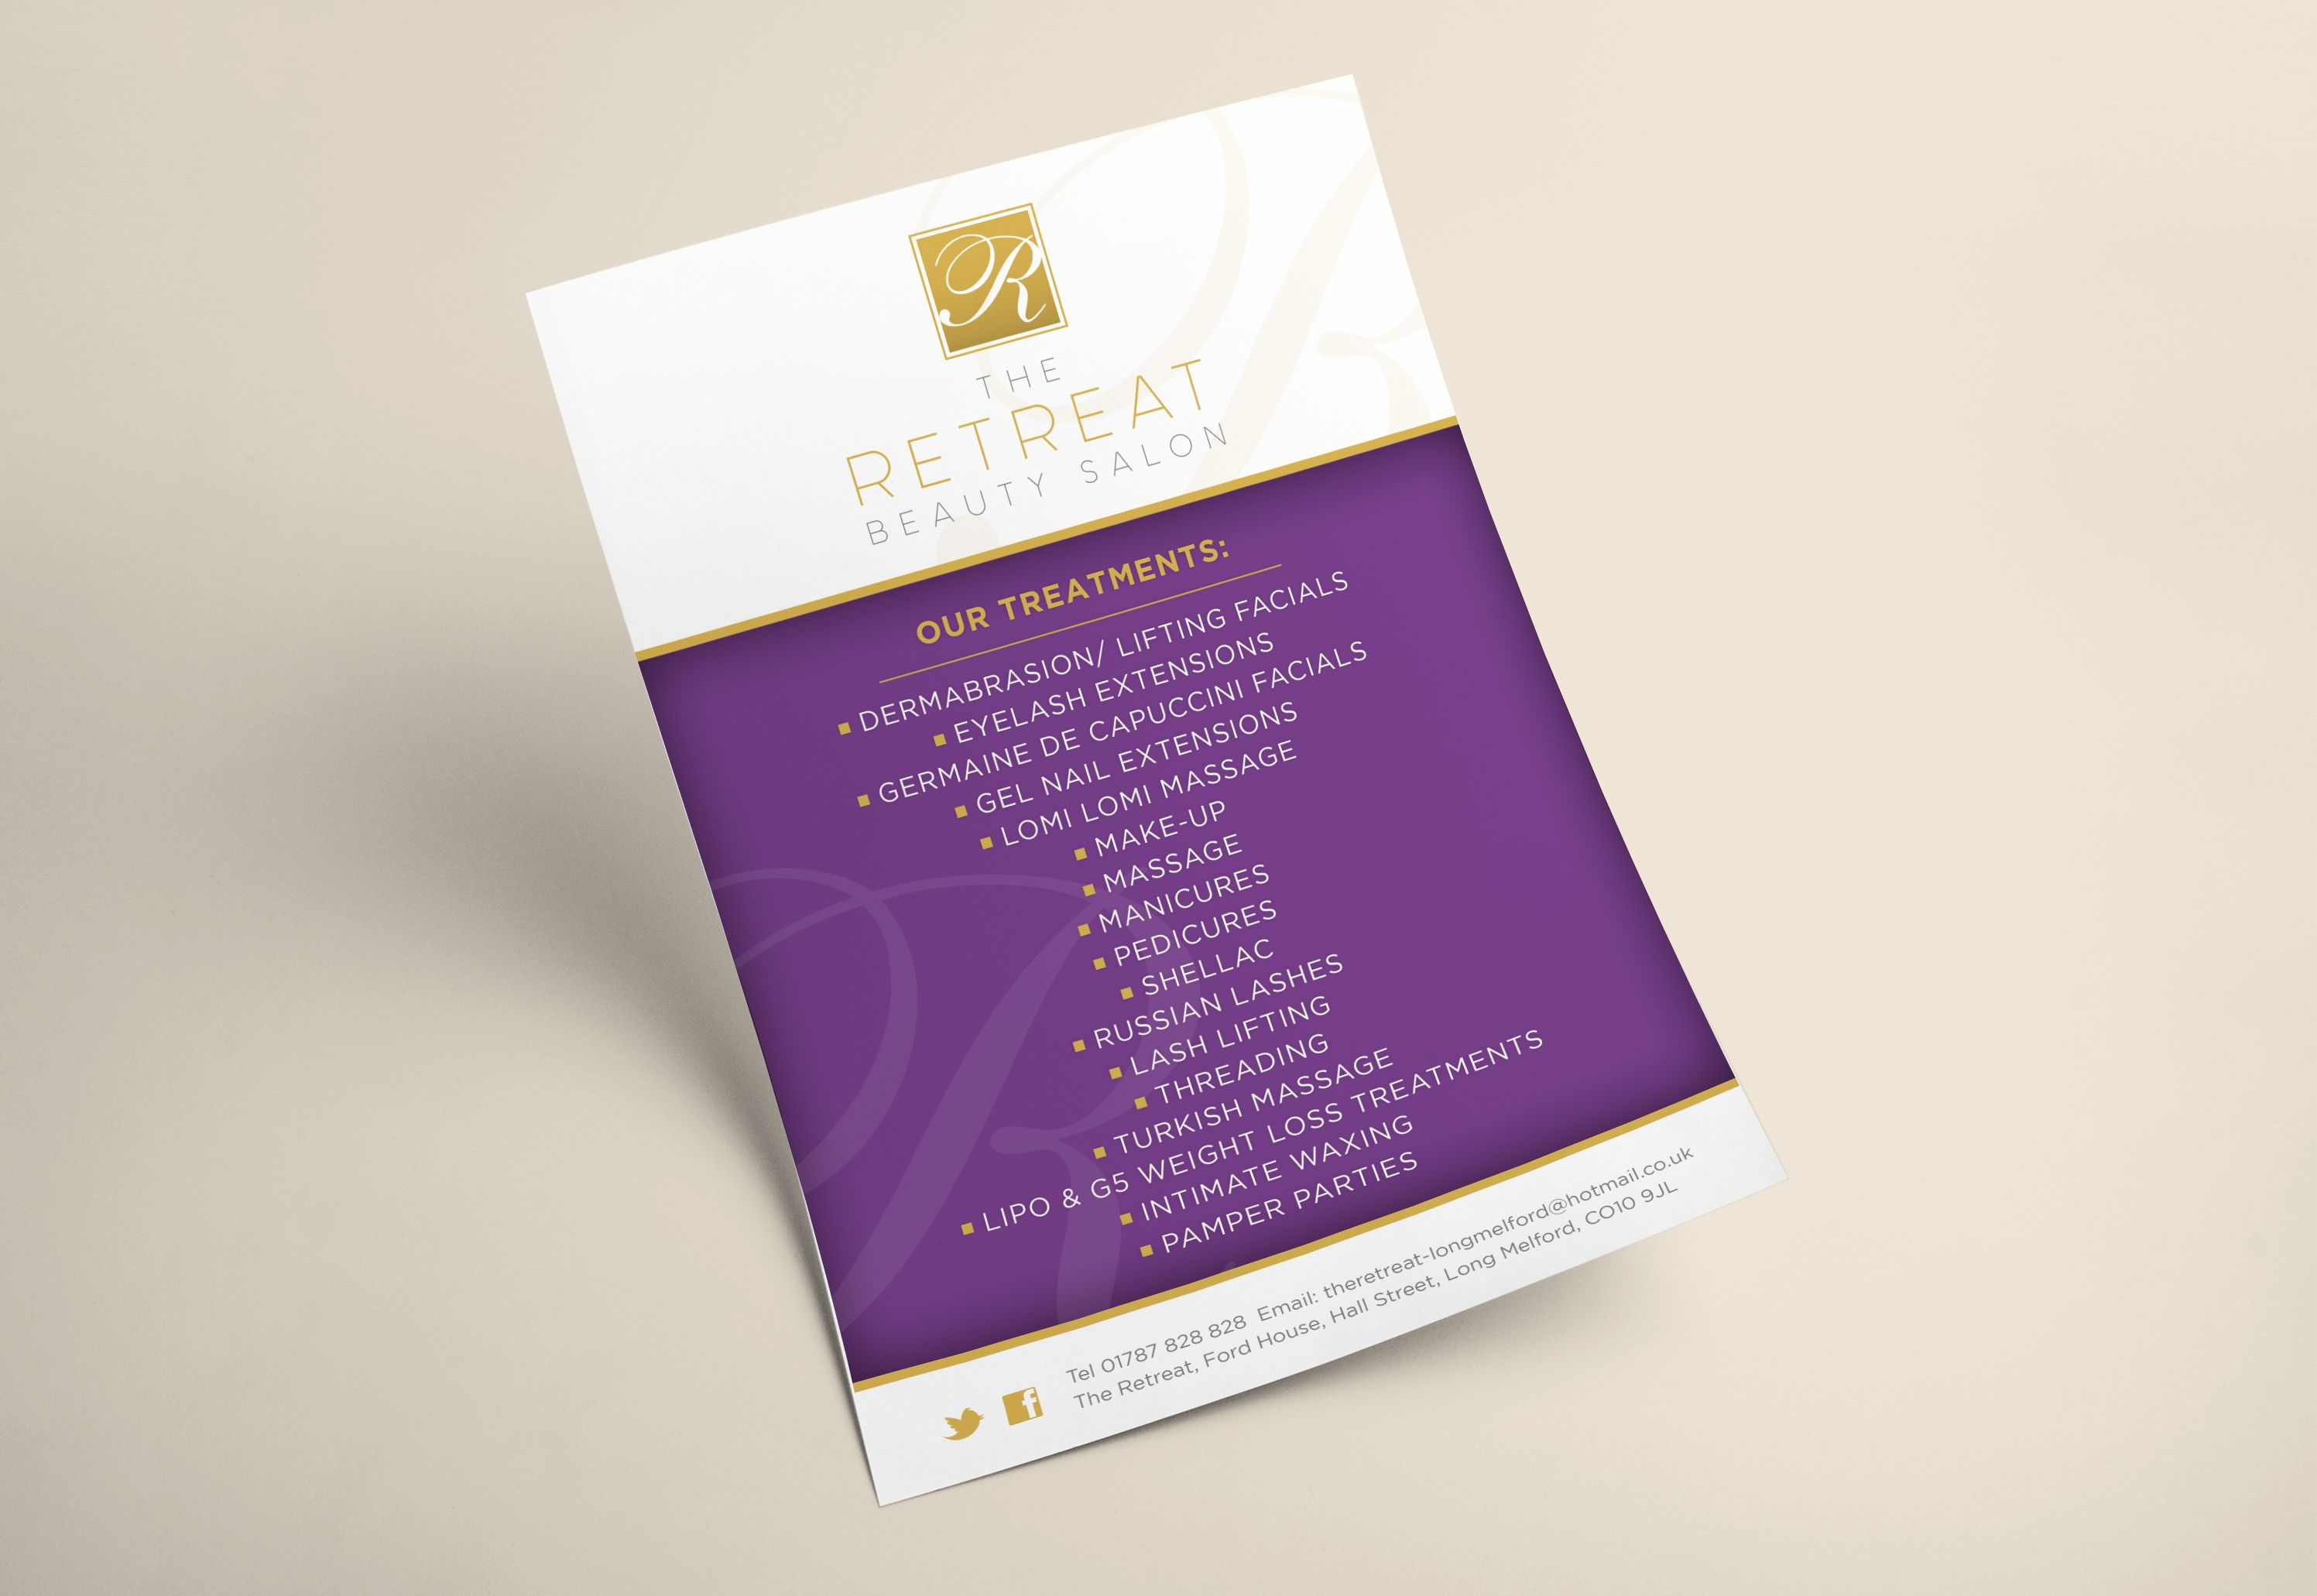 Large Format Printing Poster Printing Poster Poster Design Graphic Design Web Design Services Graphic Design Services Facial Gel